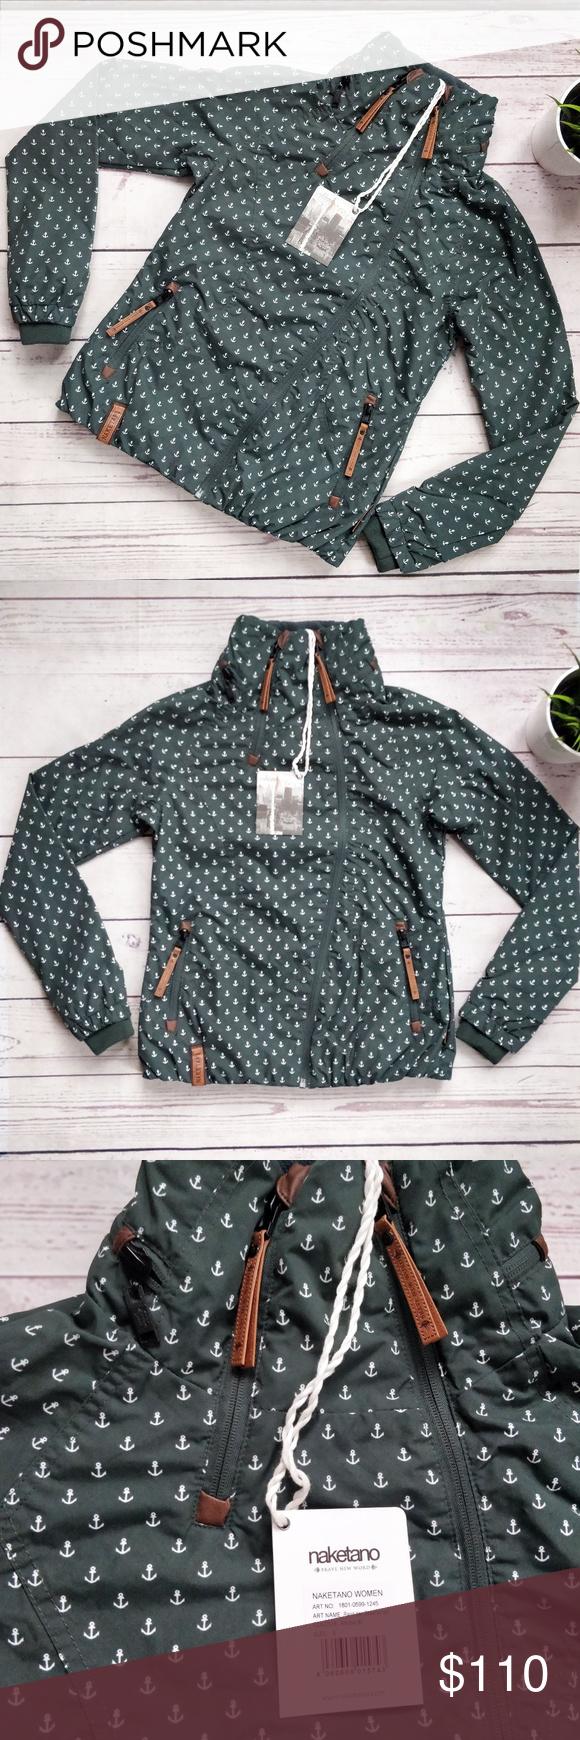 NWT NAKETANO Anchor Print Dark Green Zip Jacket S NWT